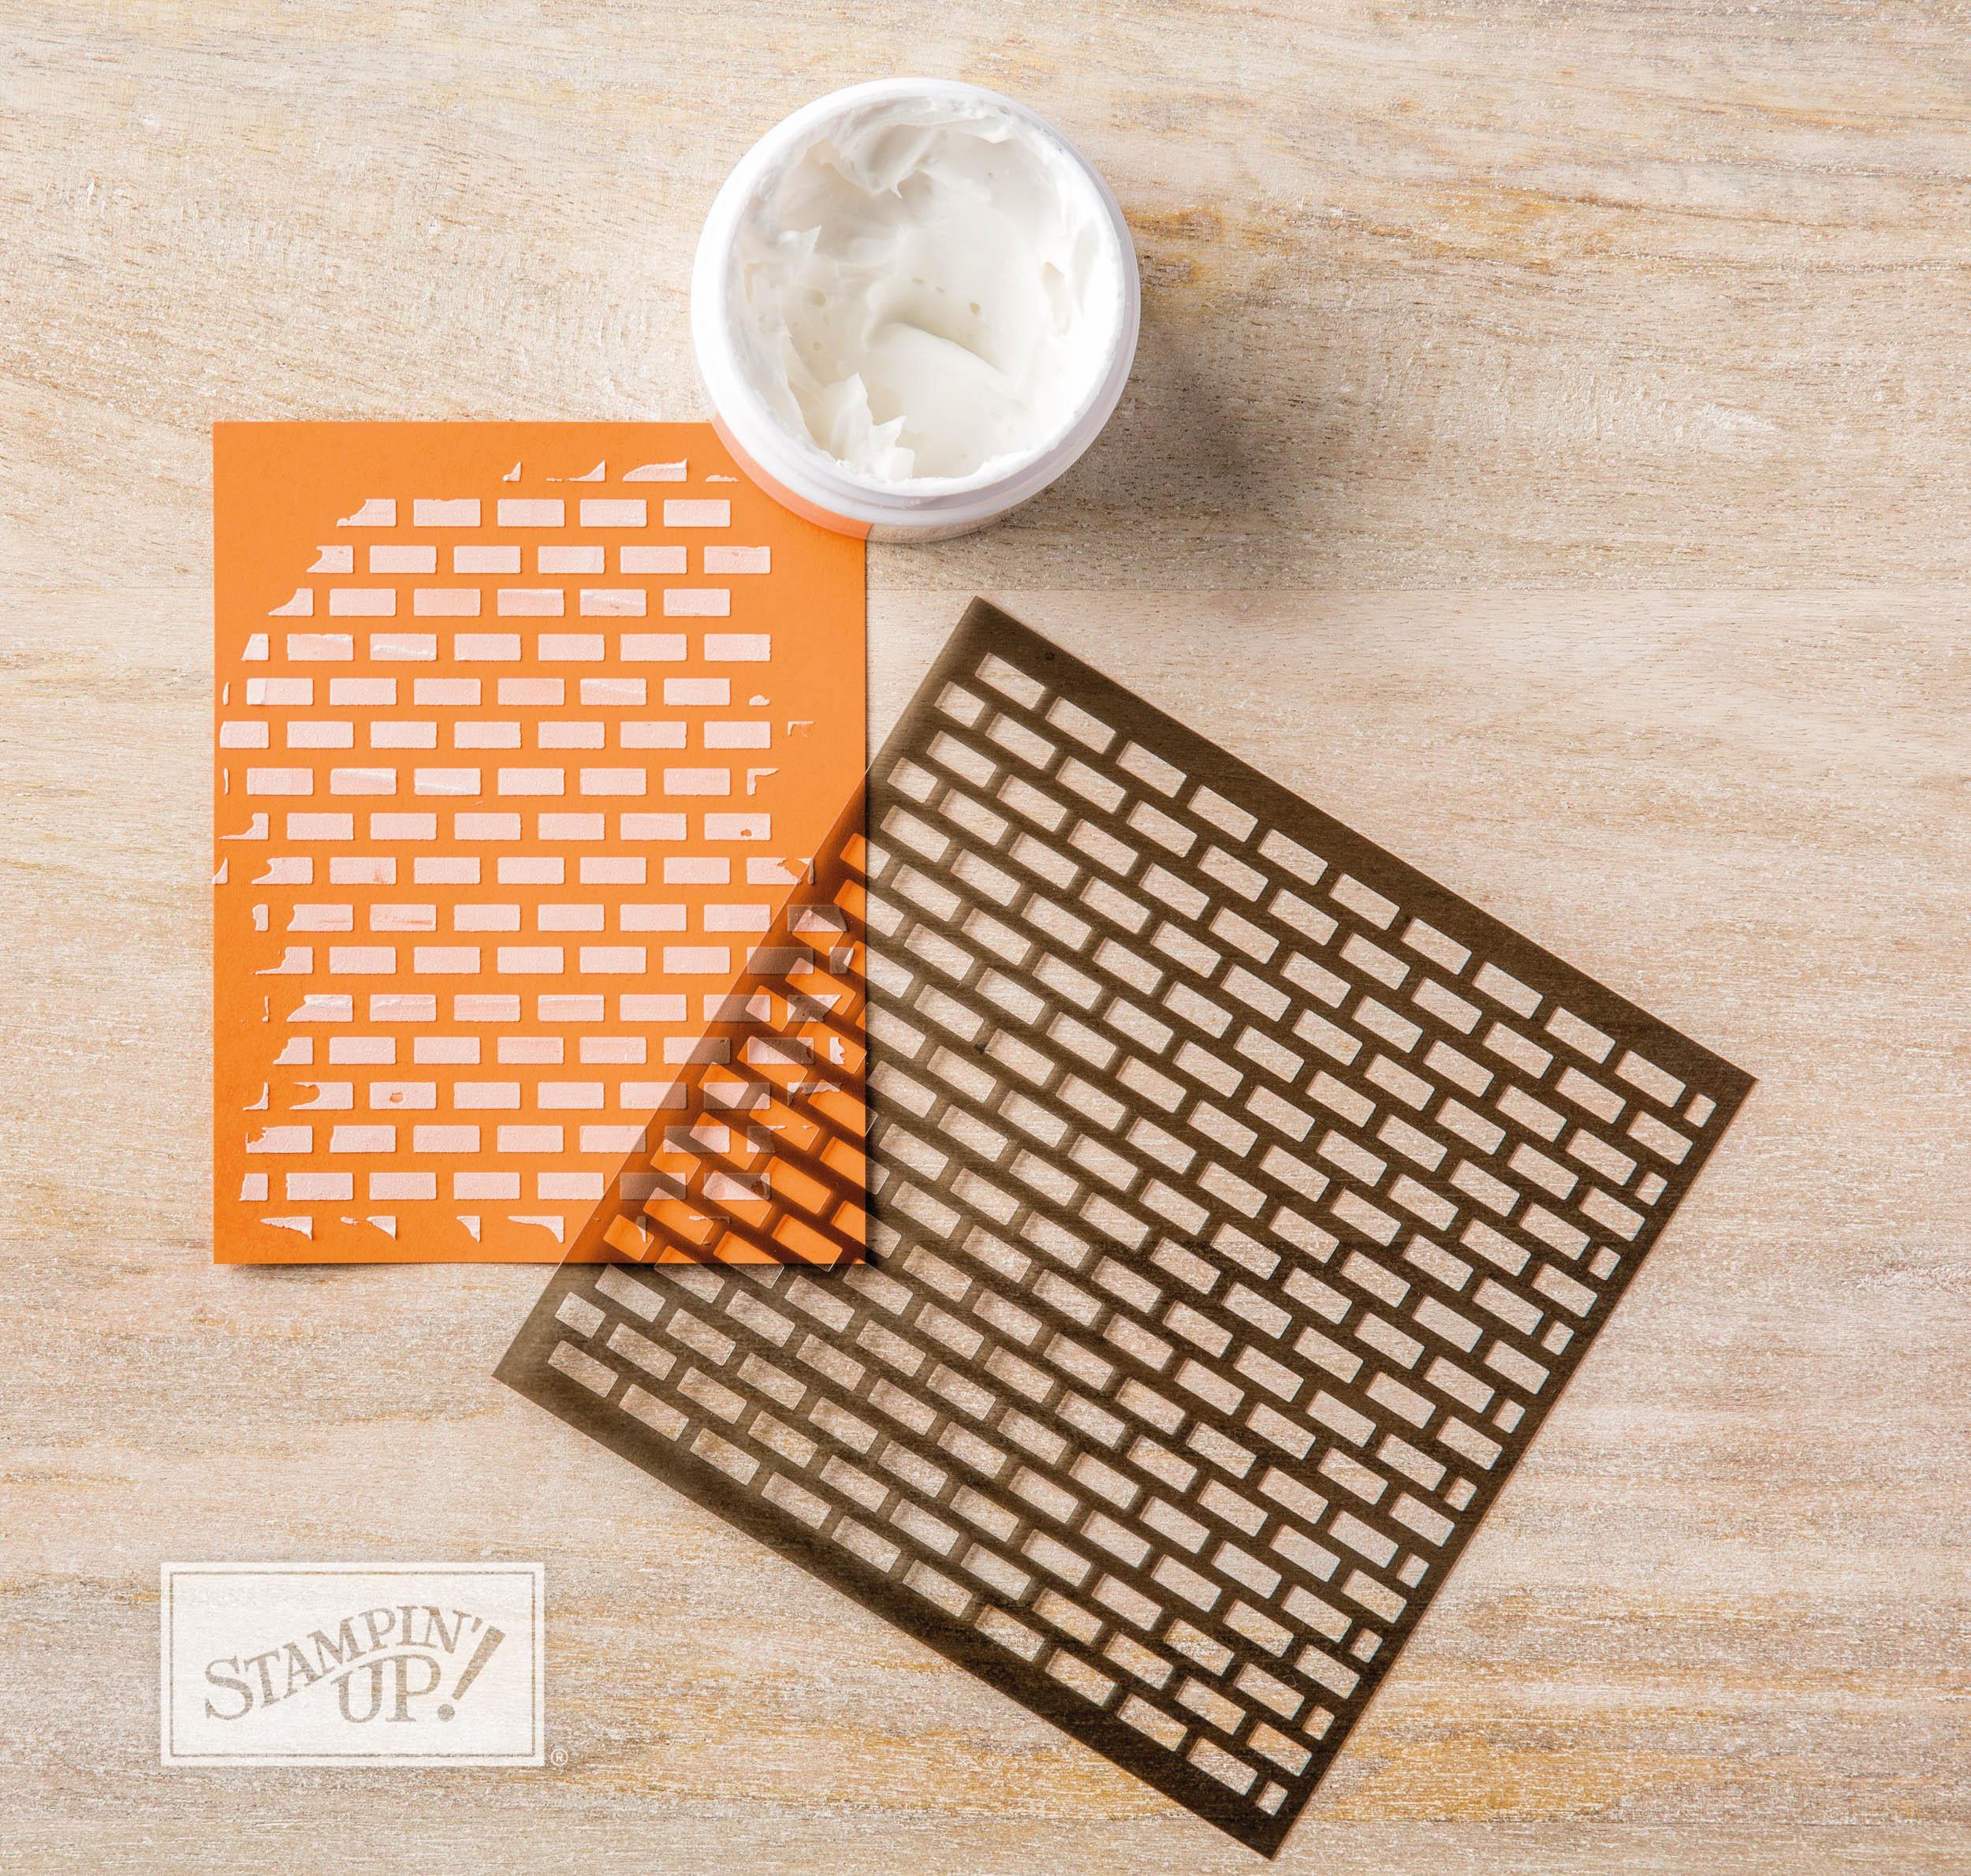 Inspiring Inkin Stampin Up! UK Amanda Fowler Paper craft card making classes Hampshire Embossing Paste